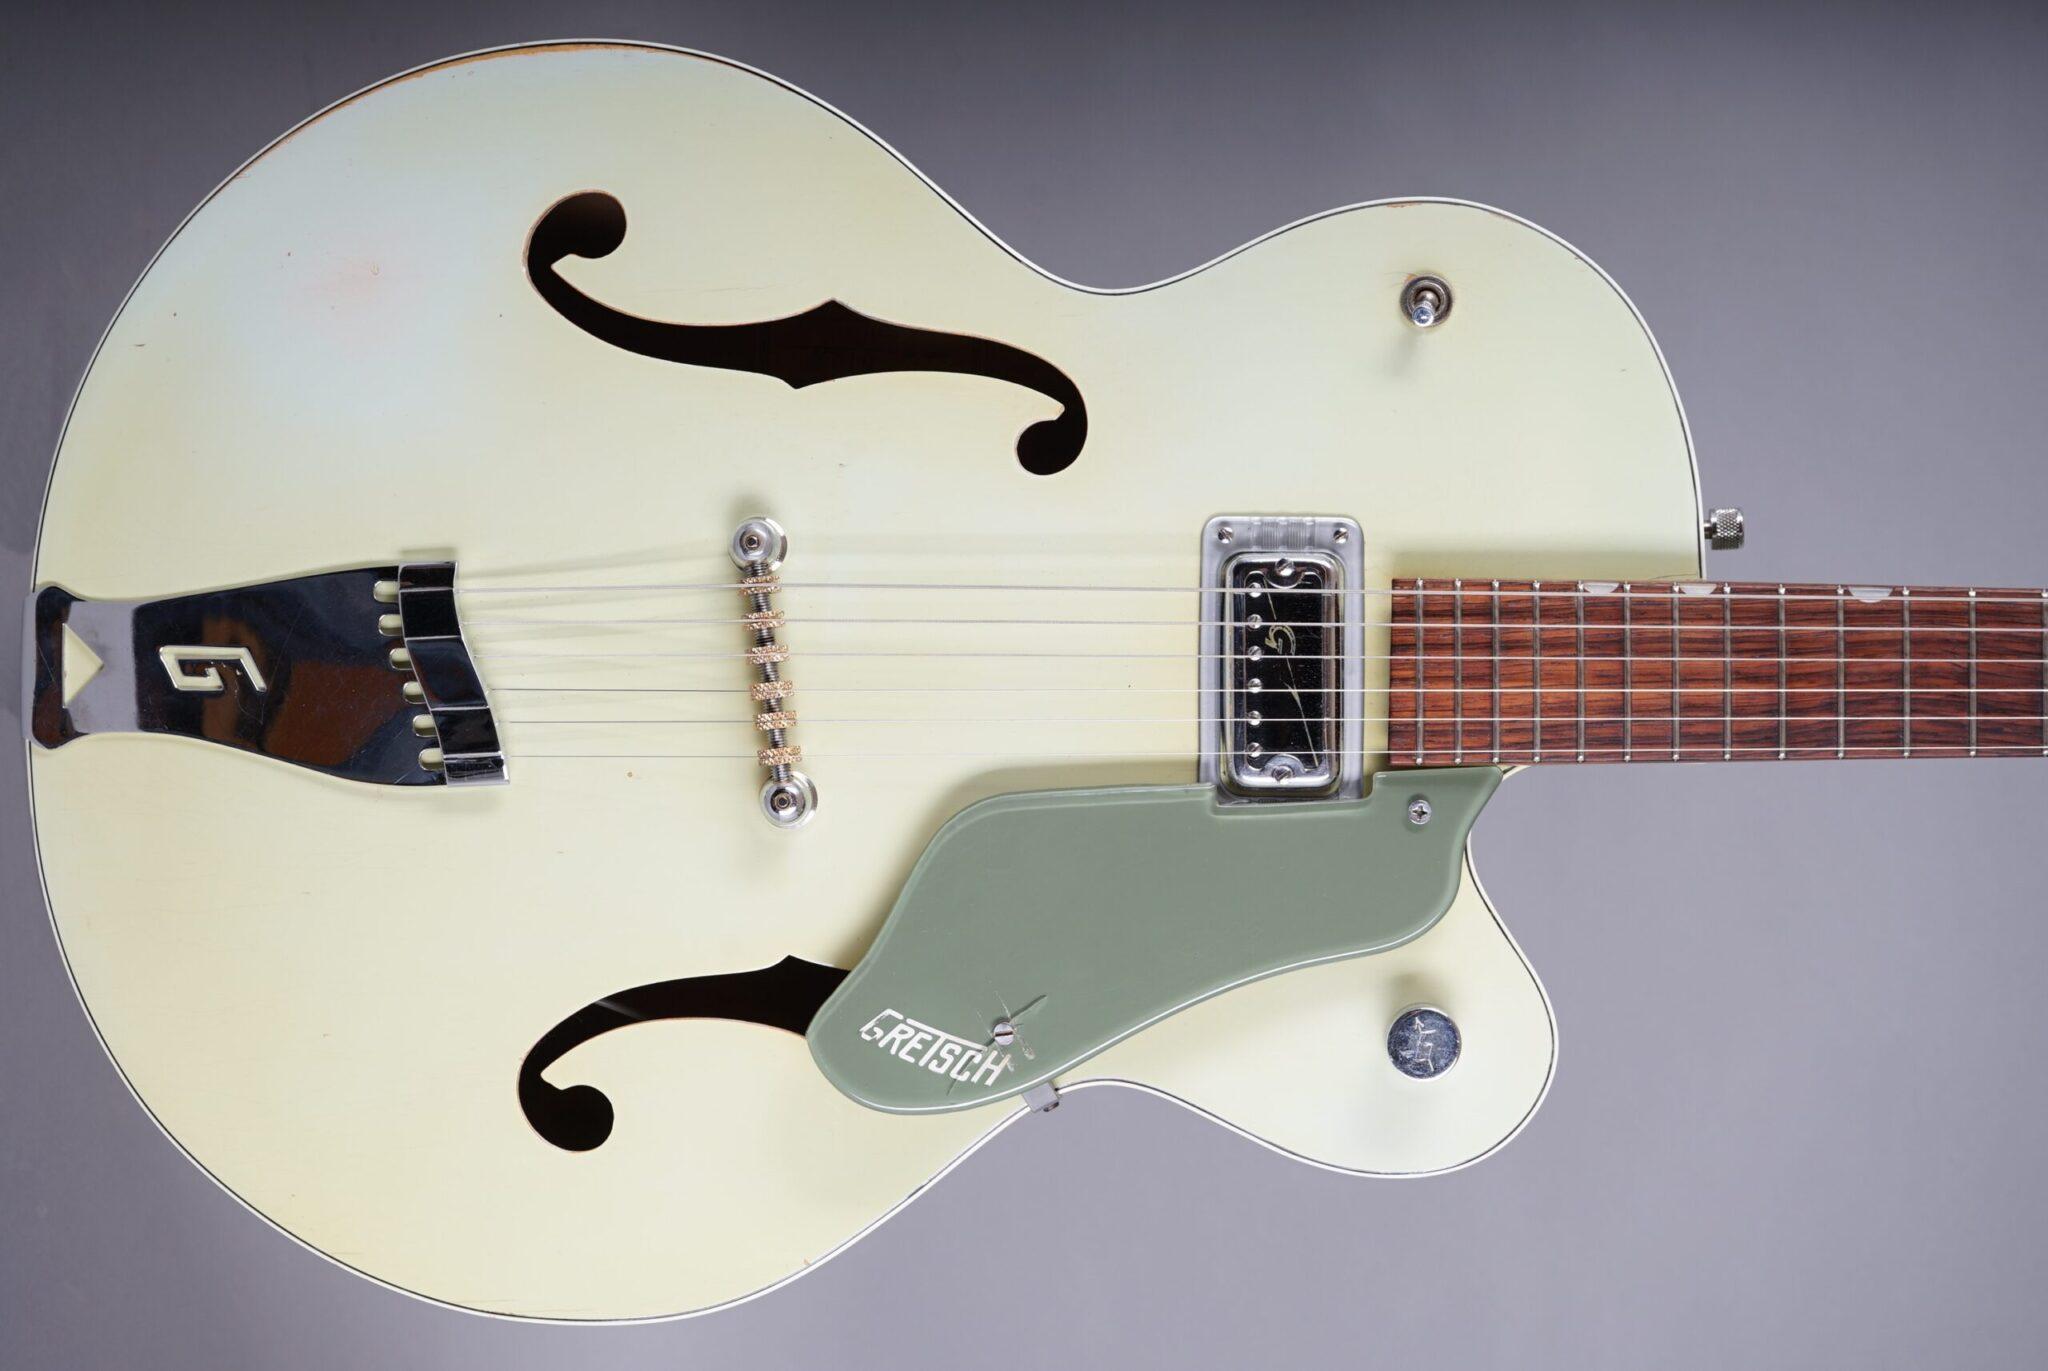 https://guitarpoint.de/app/uploads/products/1960-gretsch-6125-anniversary-2-tone-smoke-green/1960-Gretsch-6125-Anniversary-Green-35772-2q-scaled-2048x1371.jpg